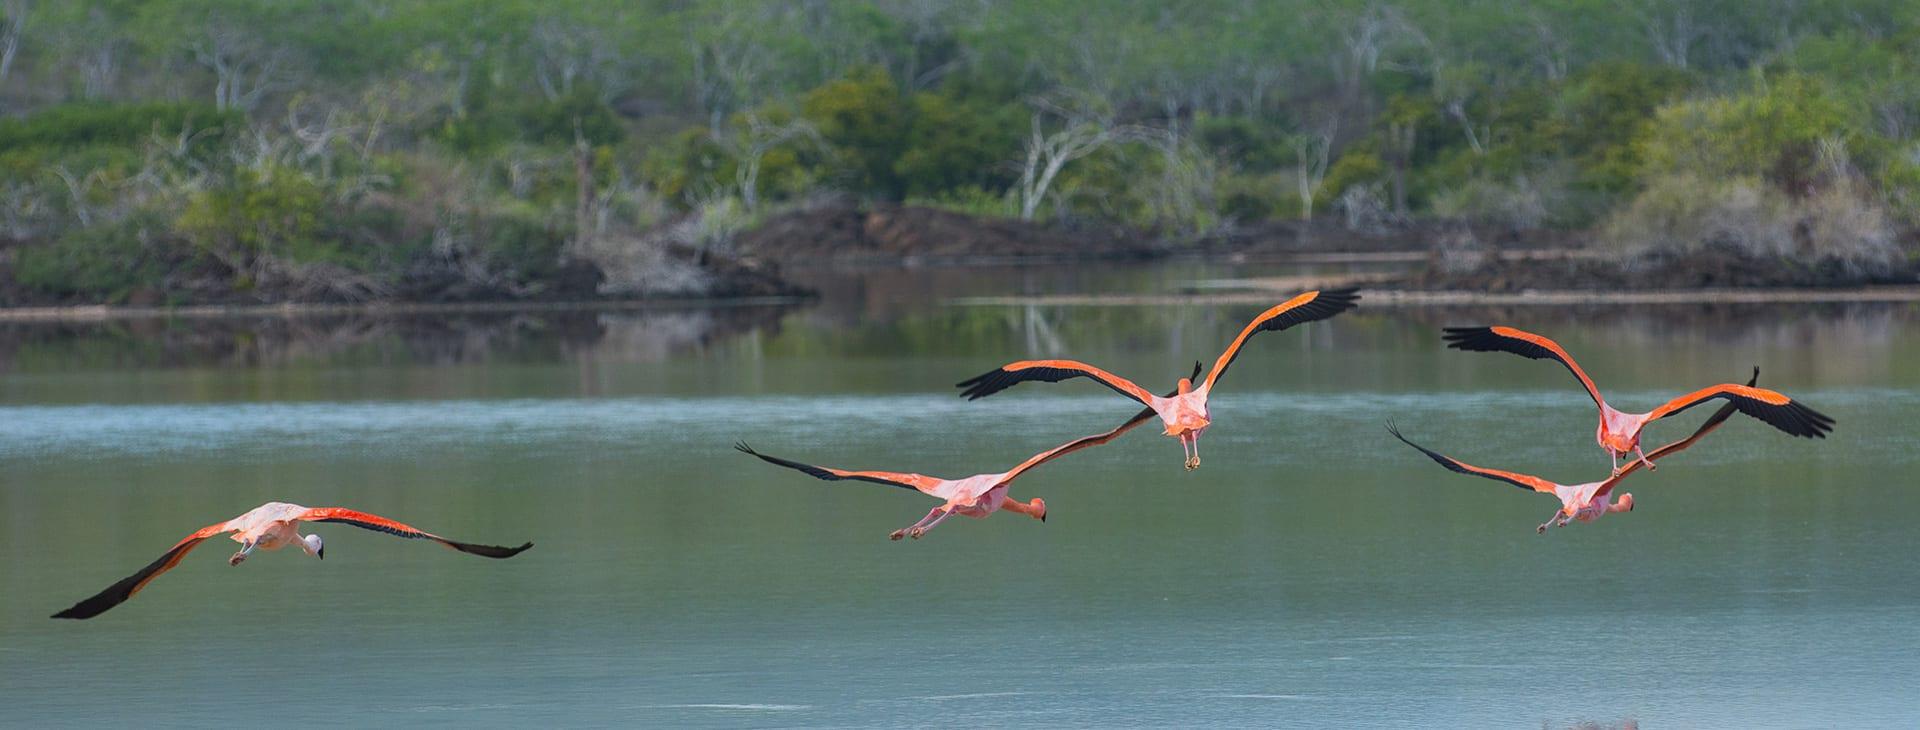 Flamingos flying over a lake